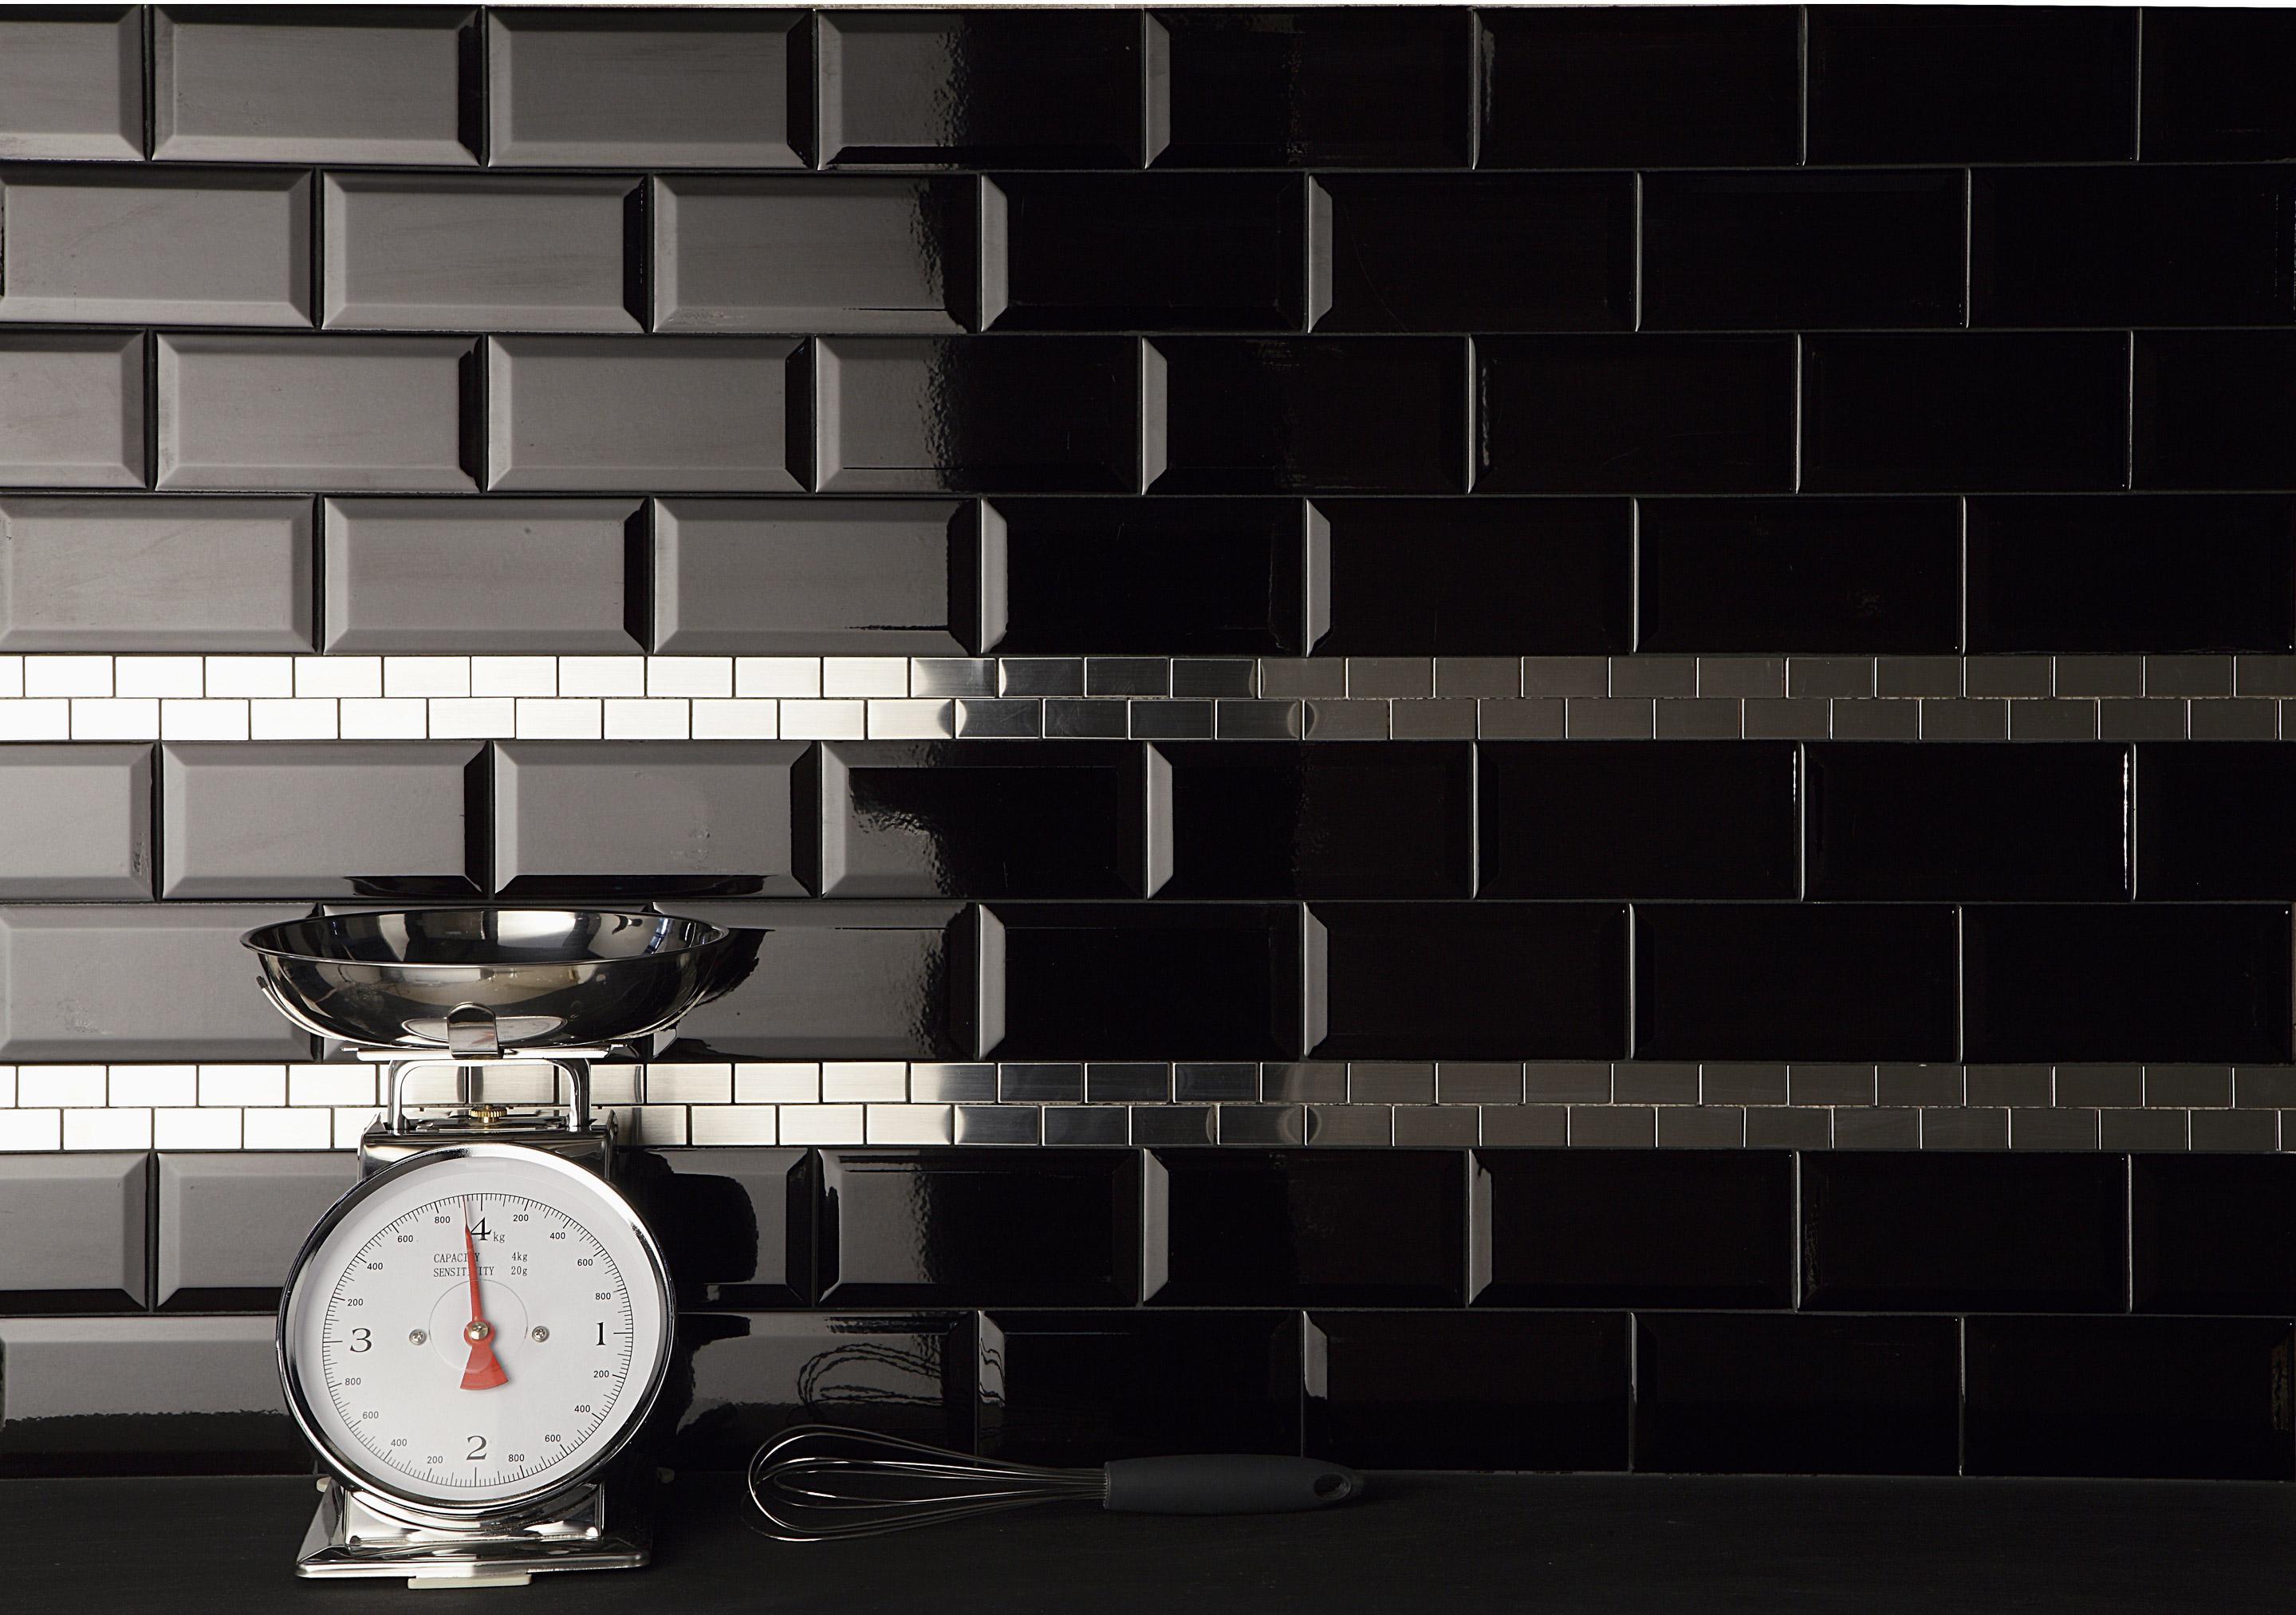 L 5 Carrelage CmMetro 7 X Mur 15 Noir Uni L Brillante nN8wm0